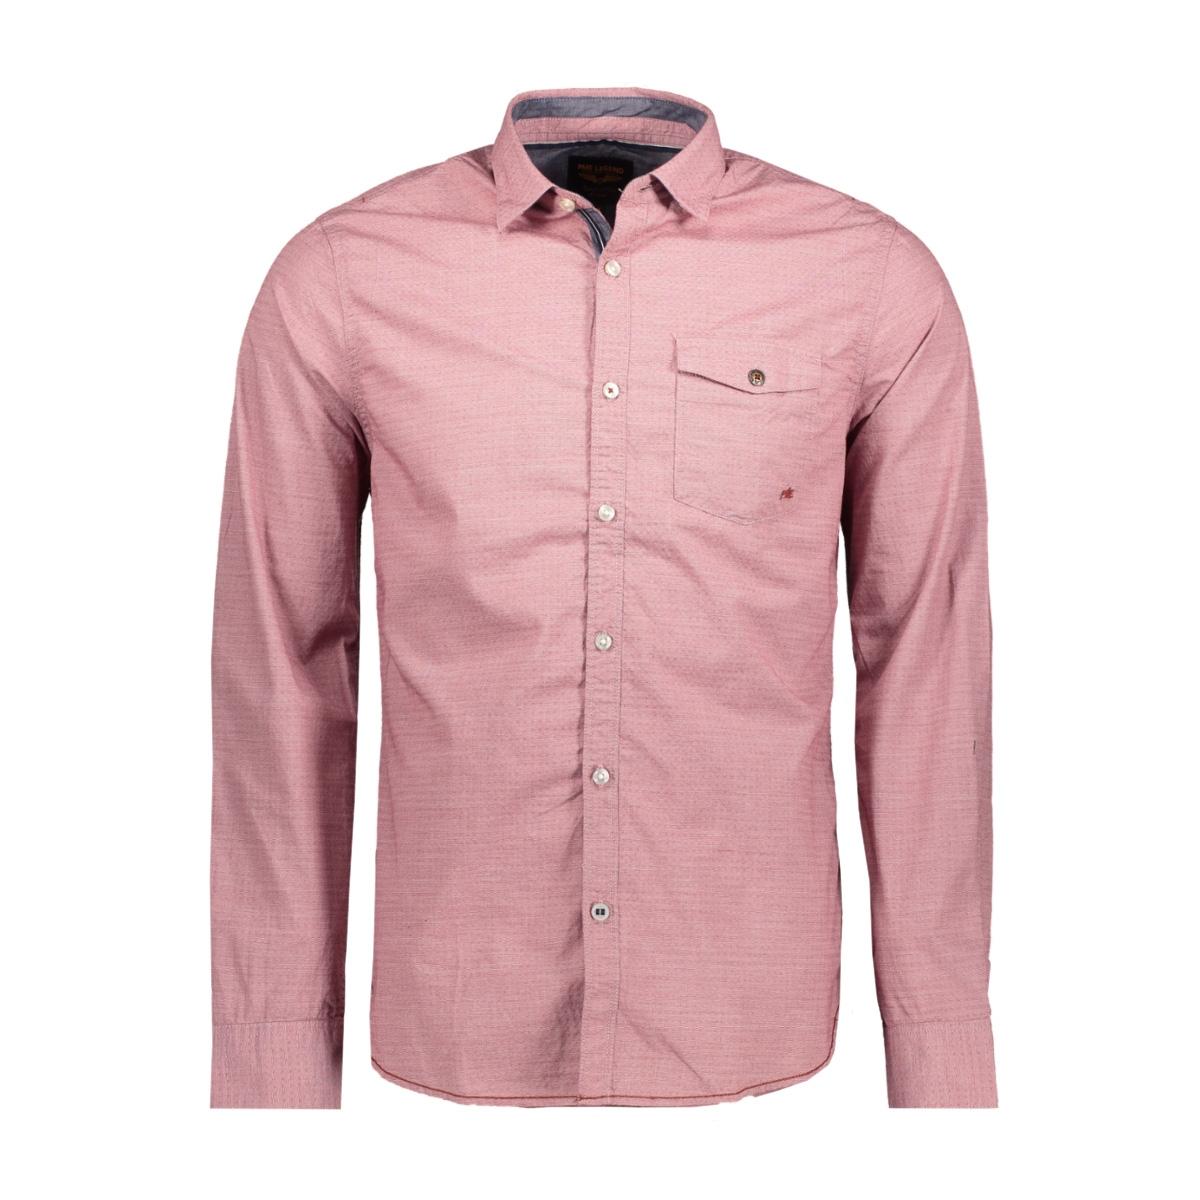 psi175224 pme legend overhemd 3049